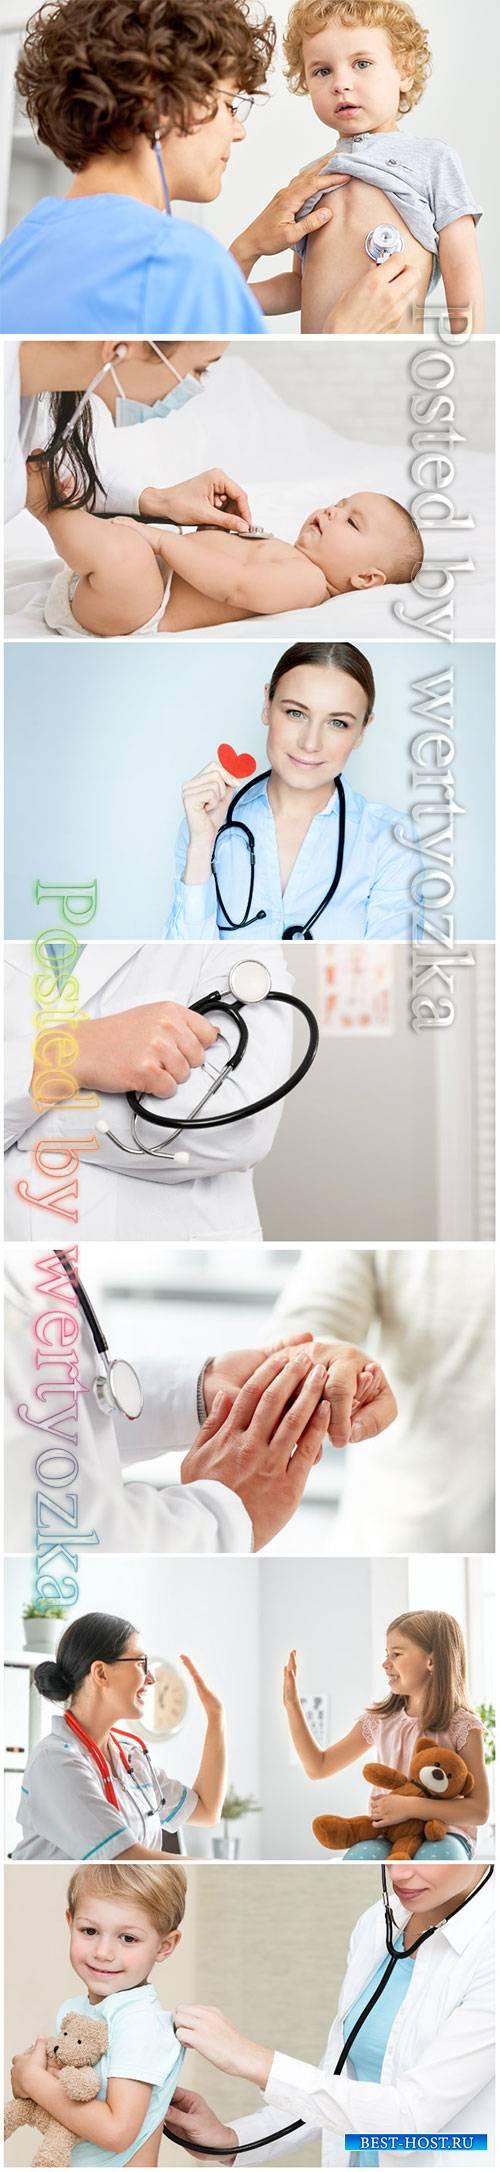 Conceptual medical, doctor beautiful stock photo